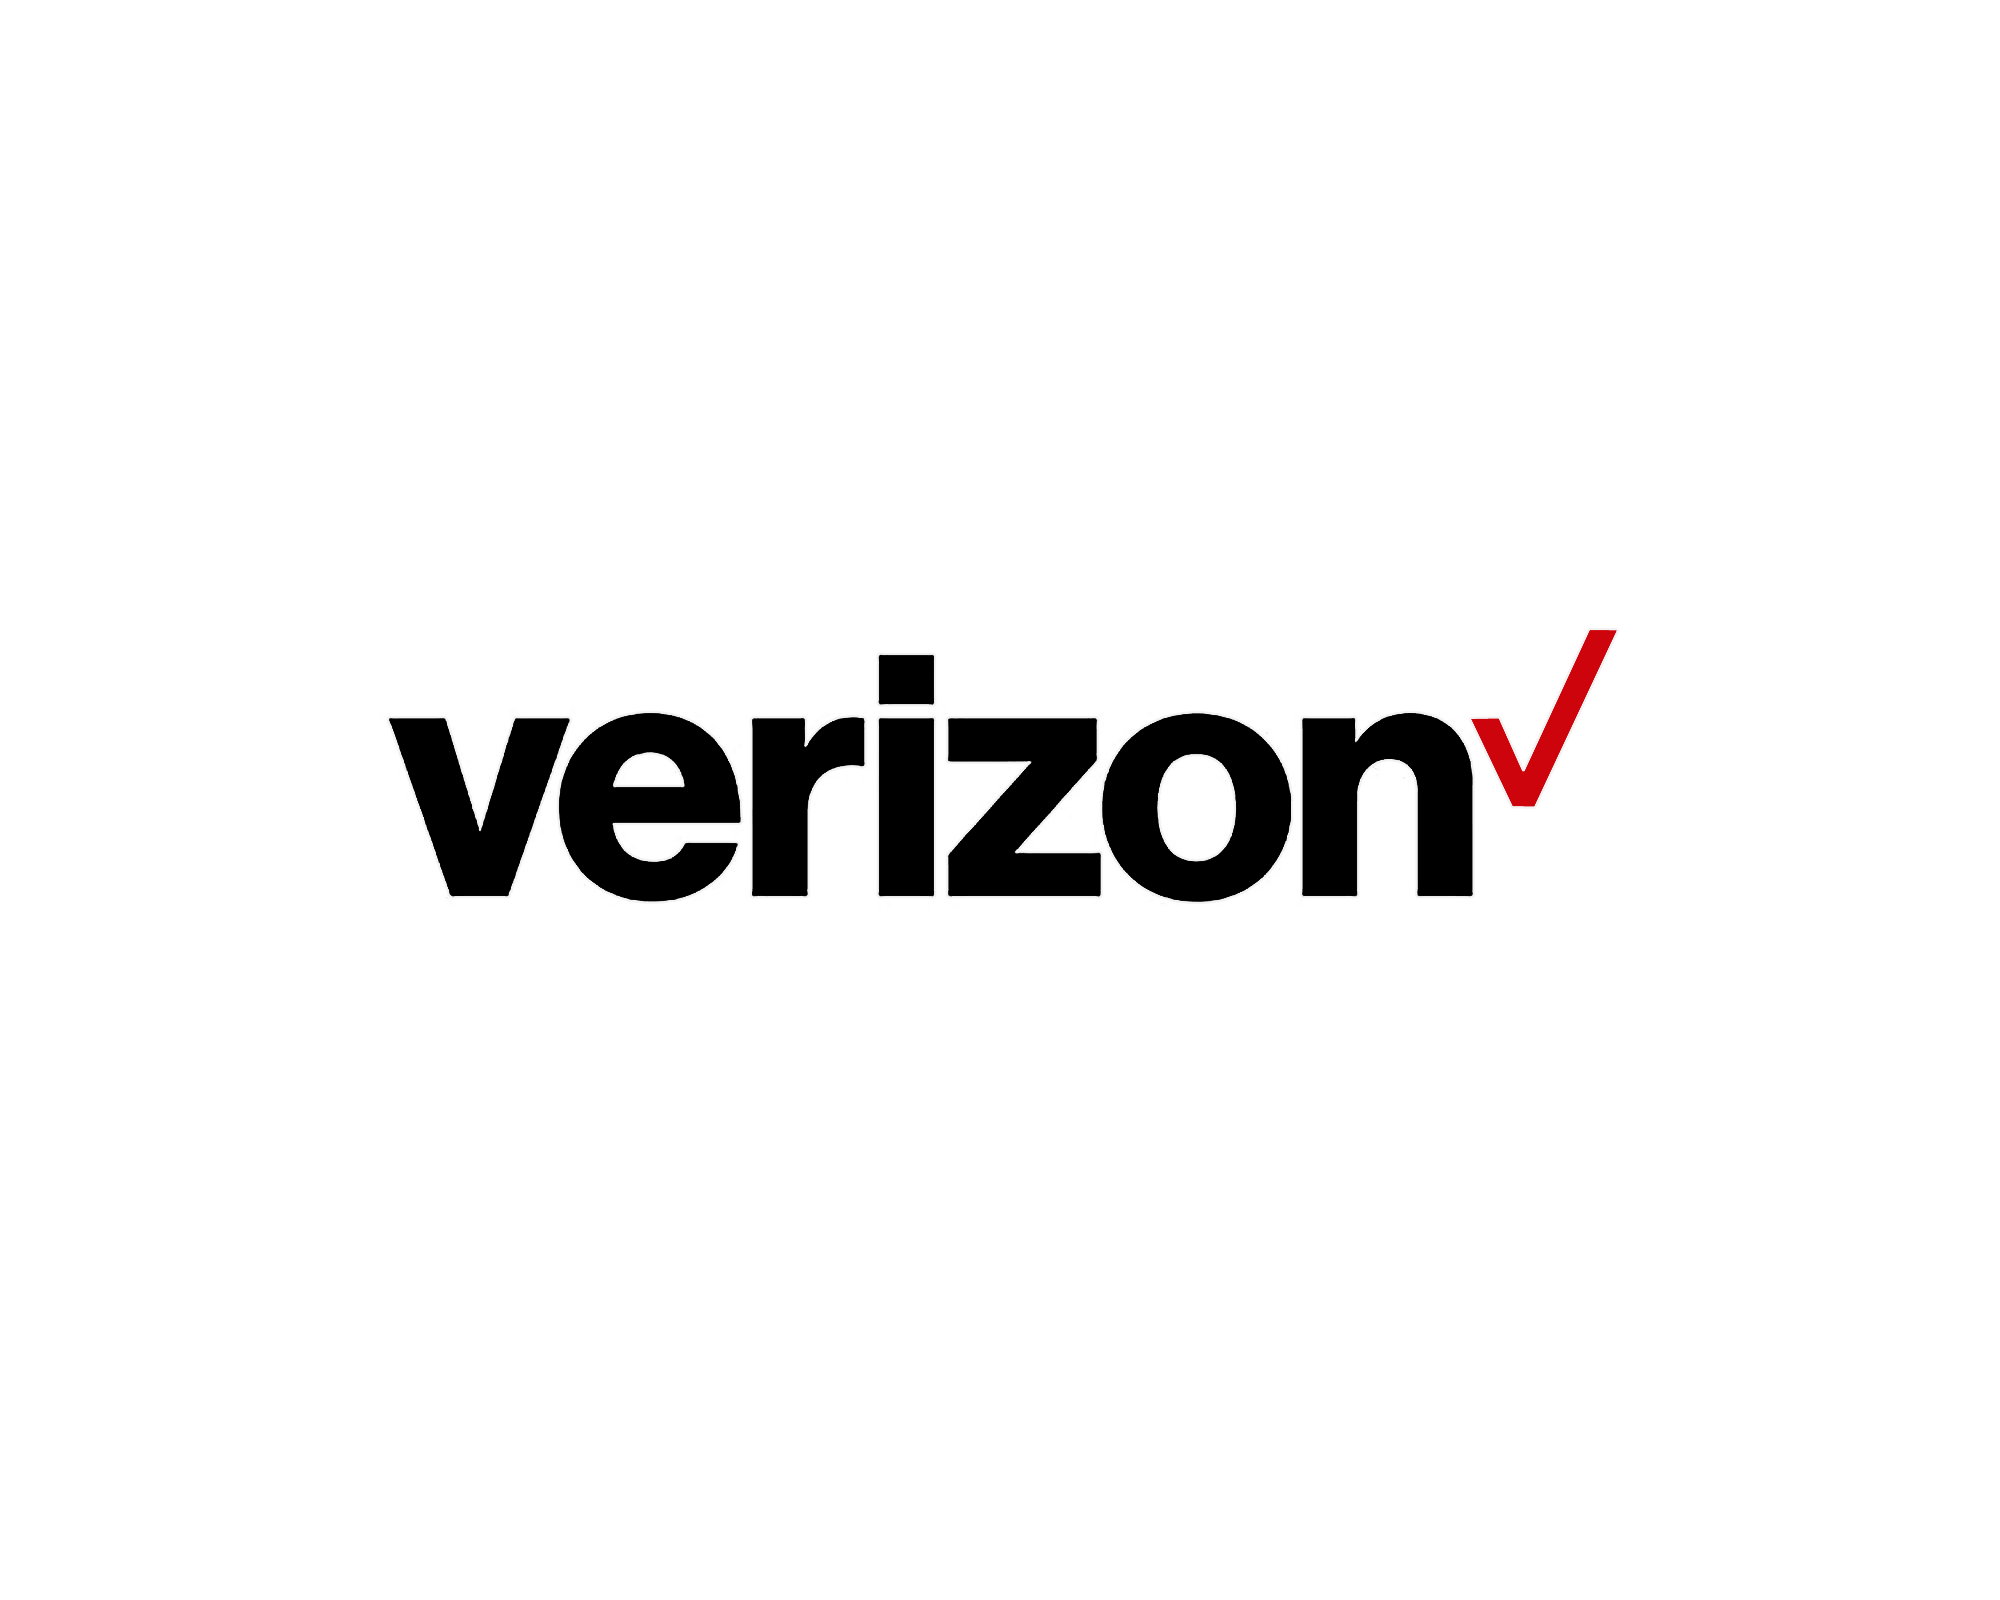 Verizon-logo-2015.png